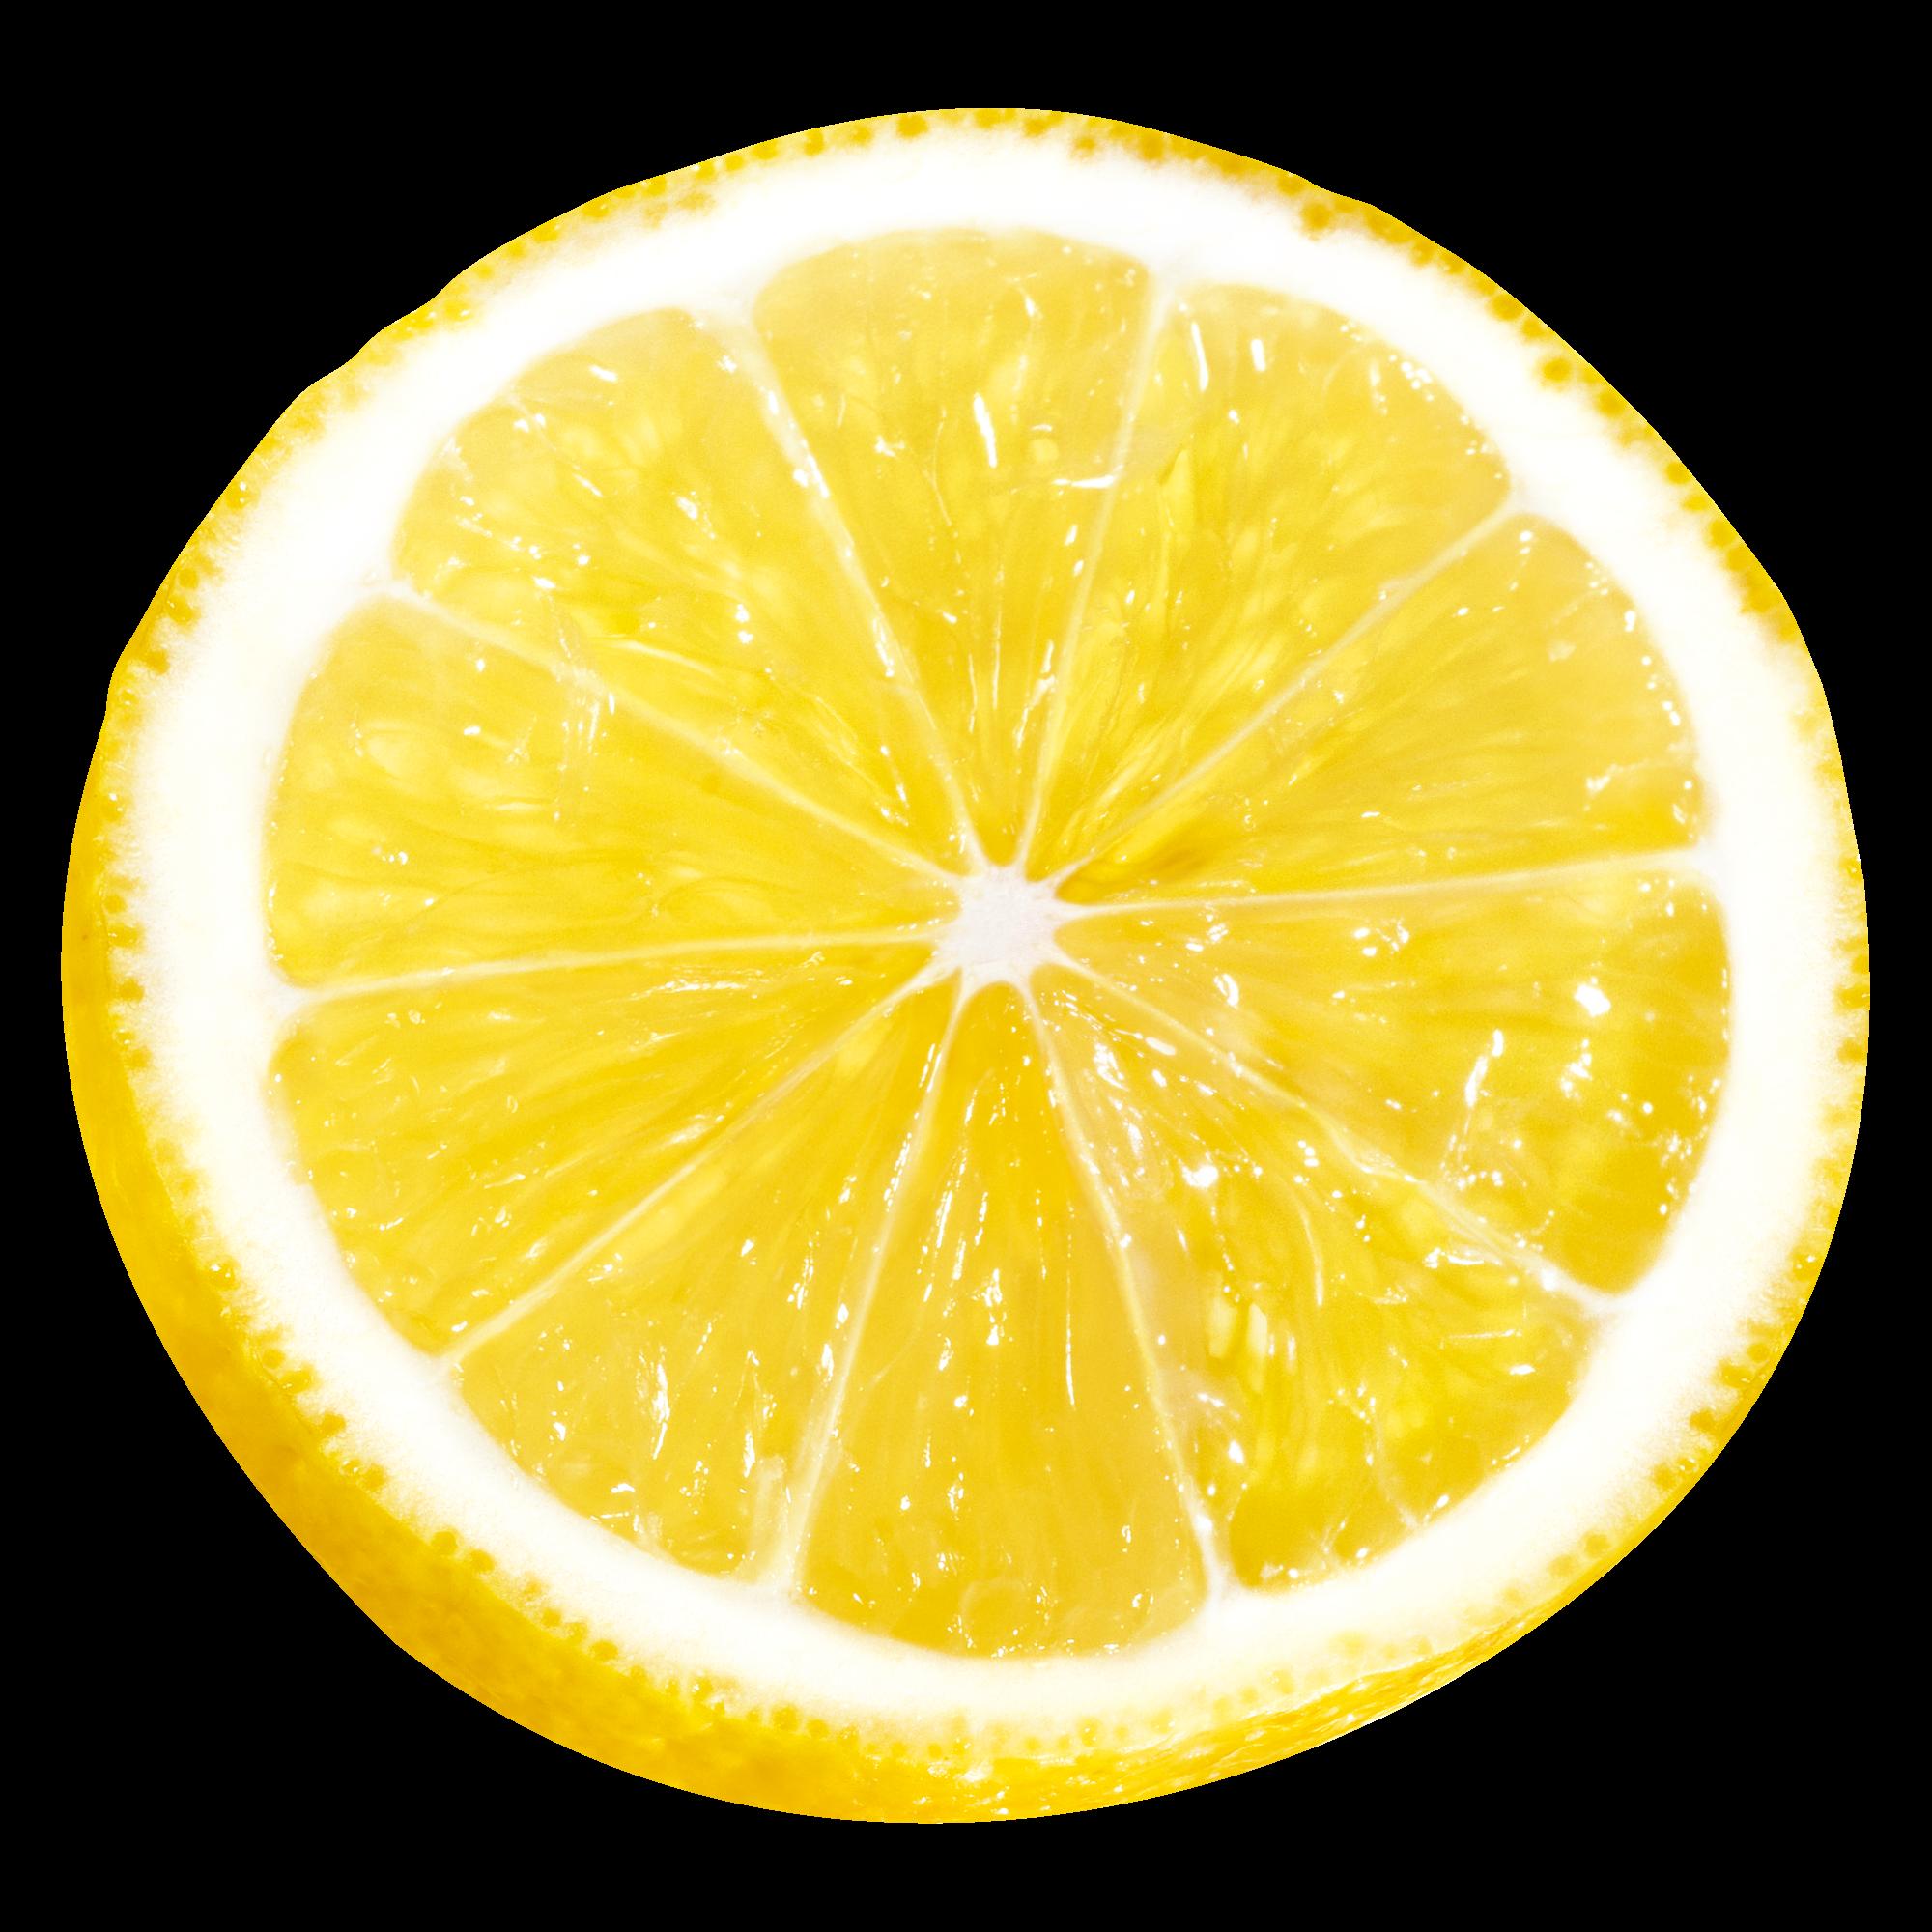 Lemon Slice Png Lemon Transparent Png Image Lemon Clipart Limon Avokado Otkrytki